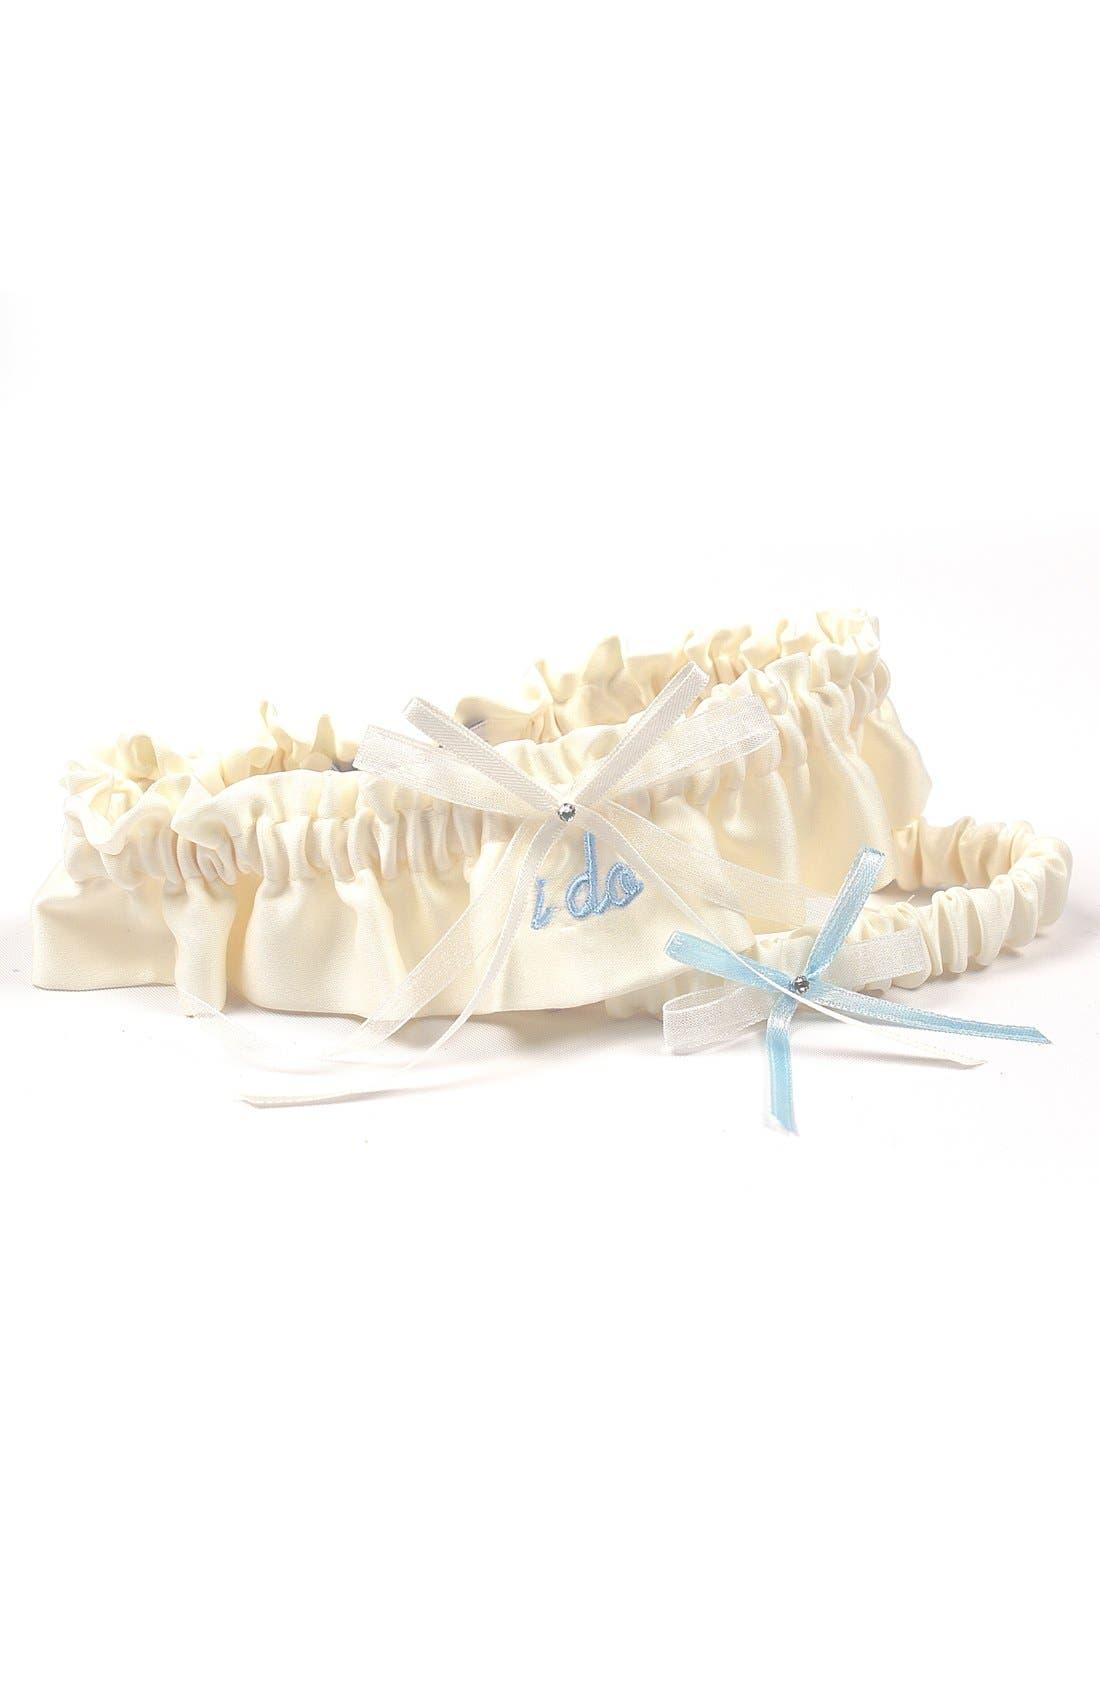 'I Do' Embroidered Garter,                         Main,                         color, Ivory